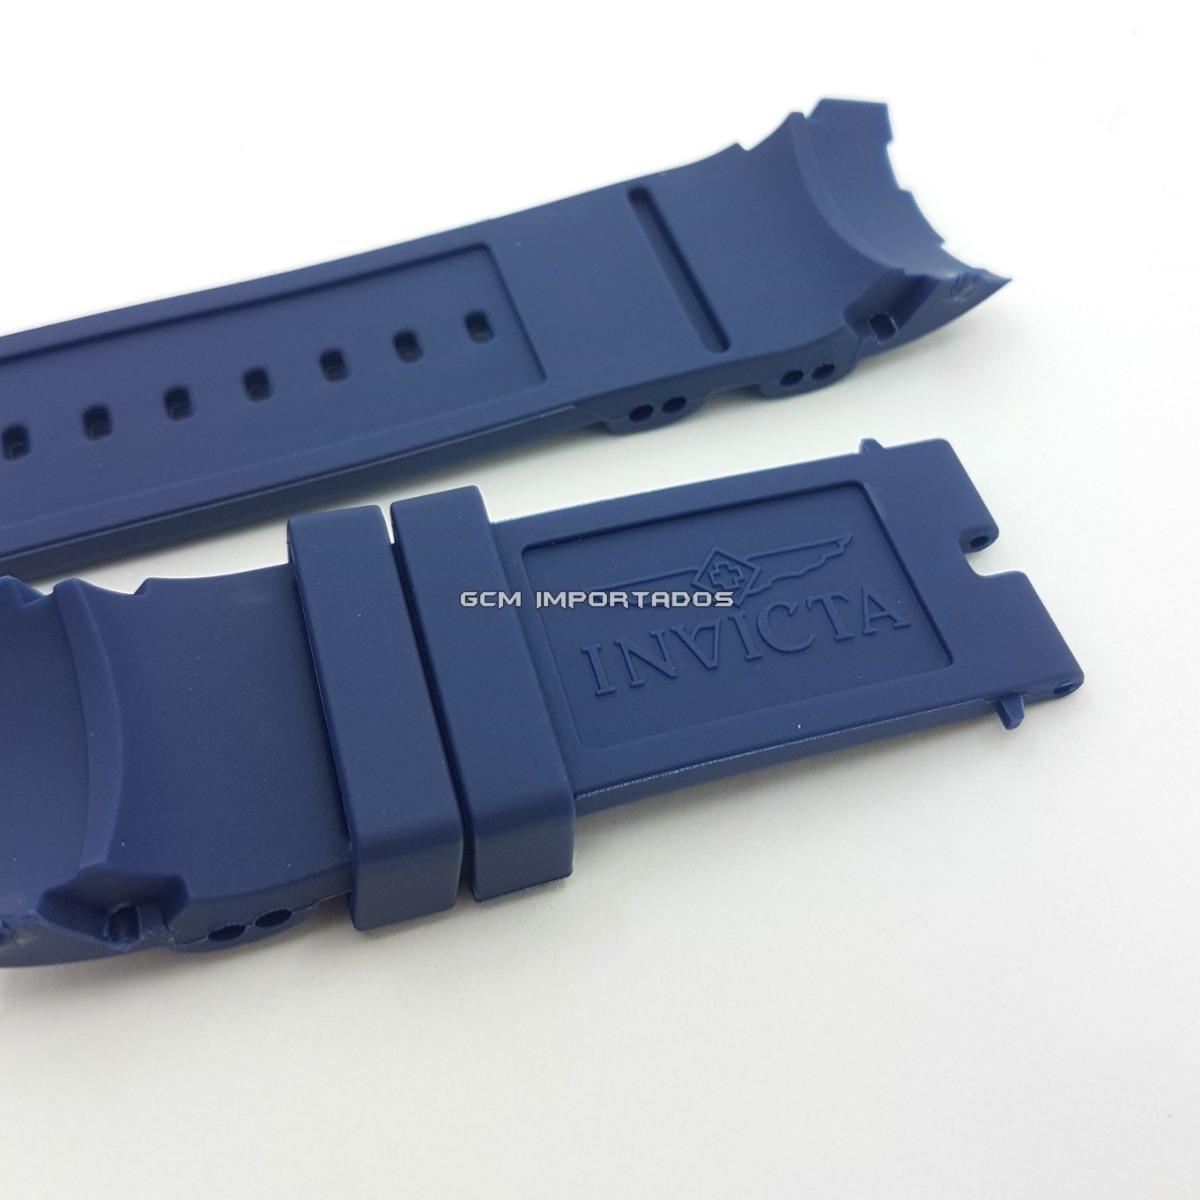 4264ebfbc1b Pulseira Invicta Pro Diver Na Cor Azul Em Borracha - R  59